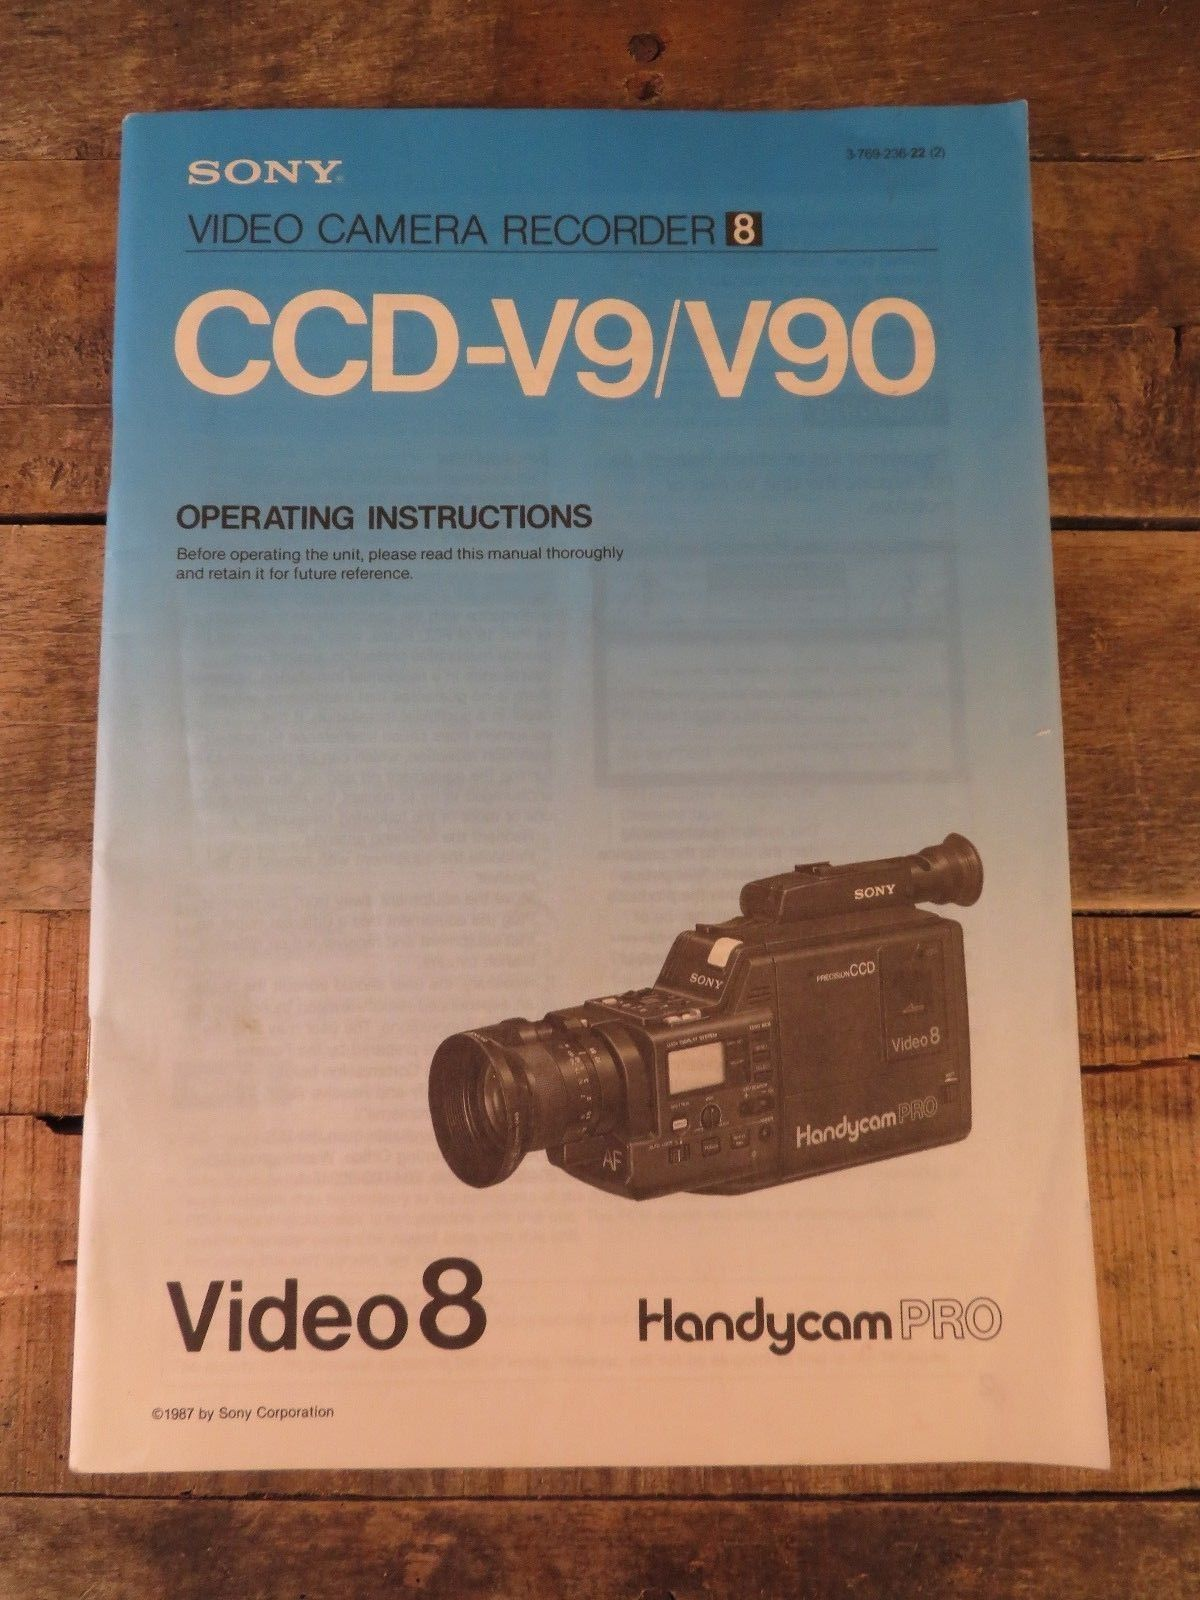 Sony Video 8 Handycam Pro CCD-V9 /V90 and 25 similar items